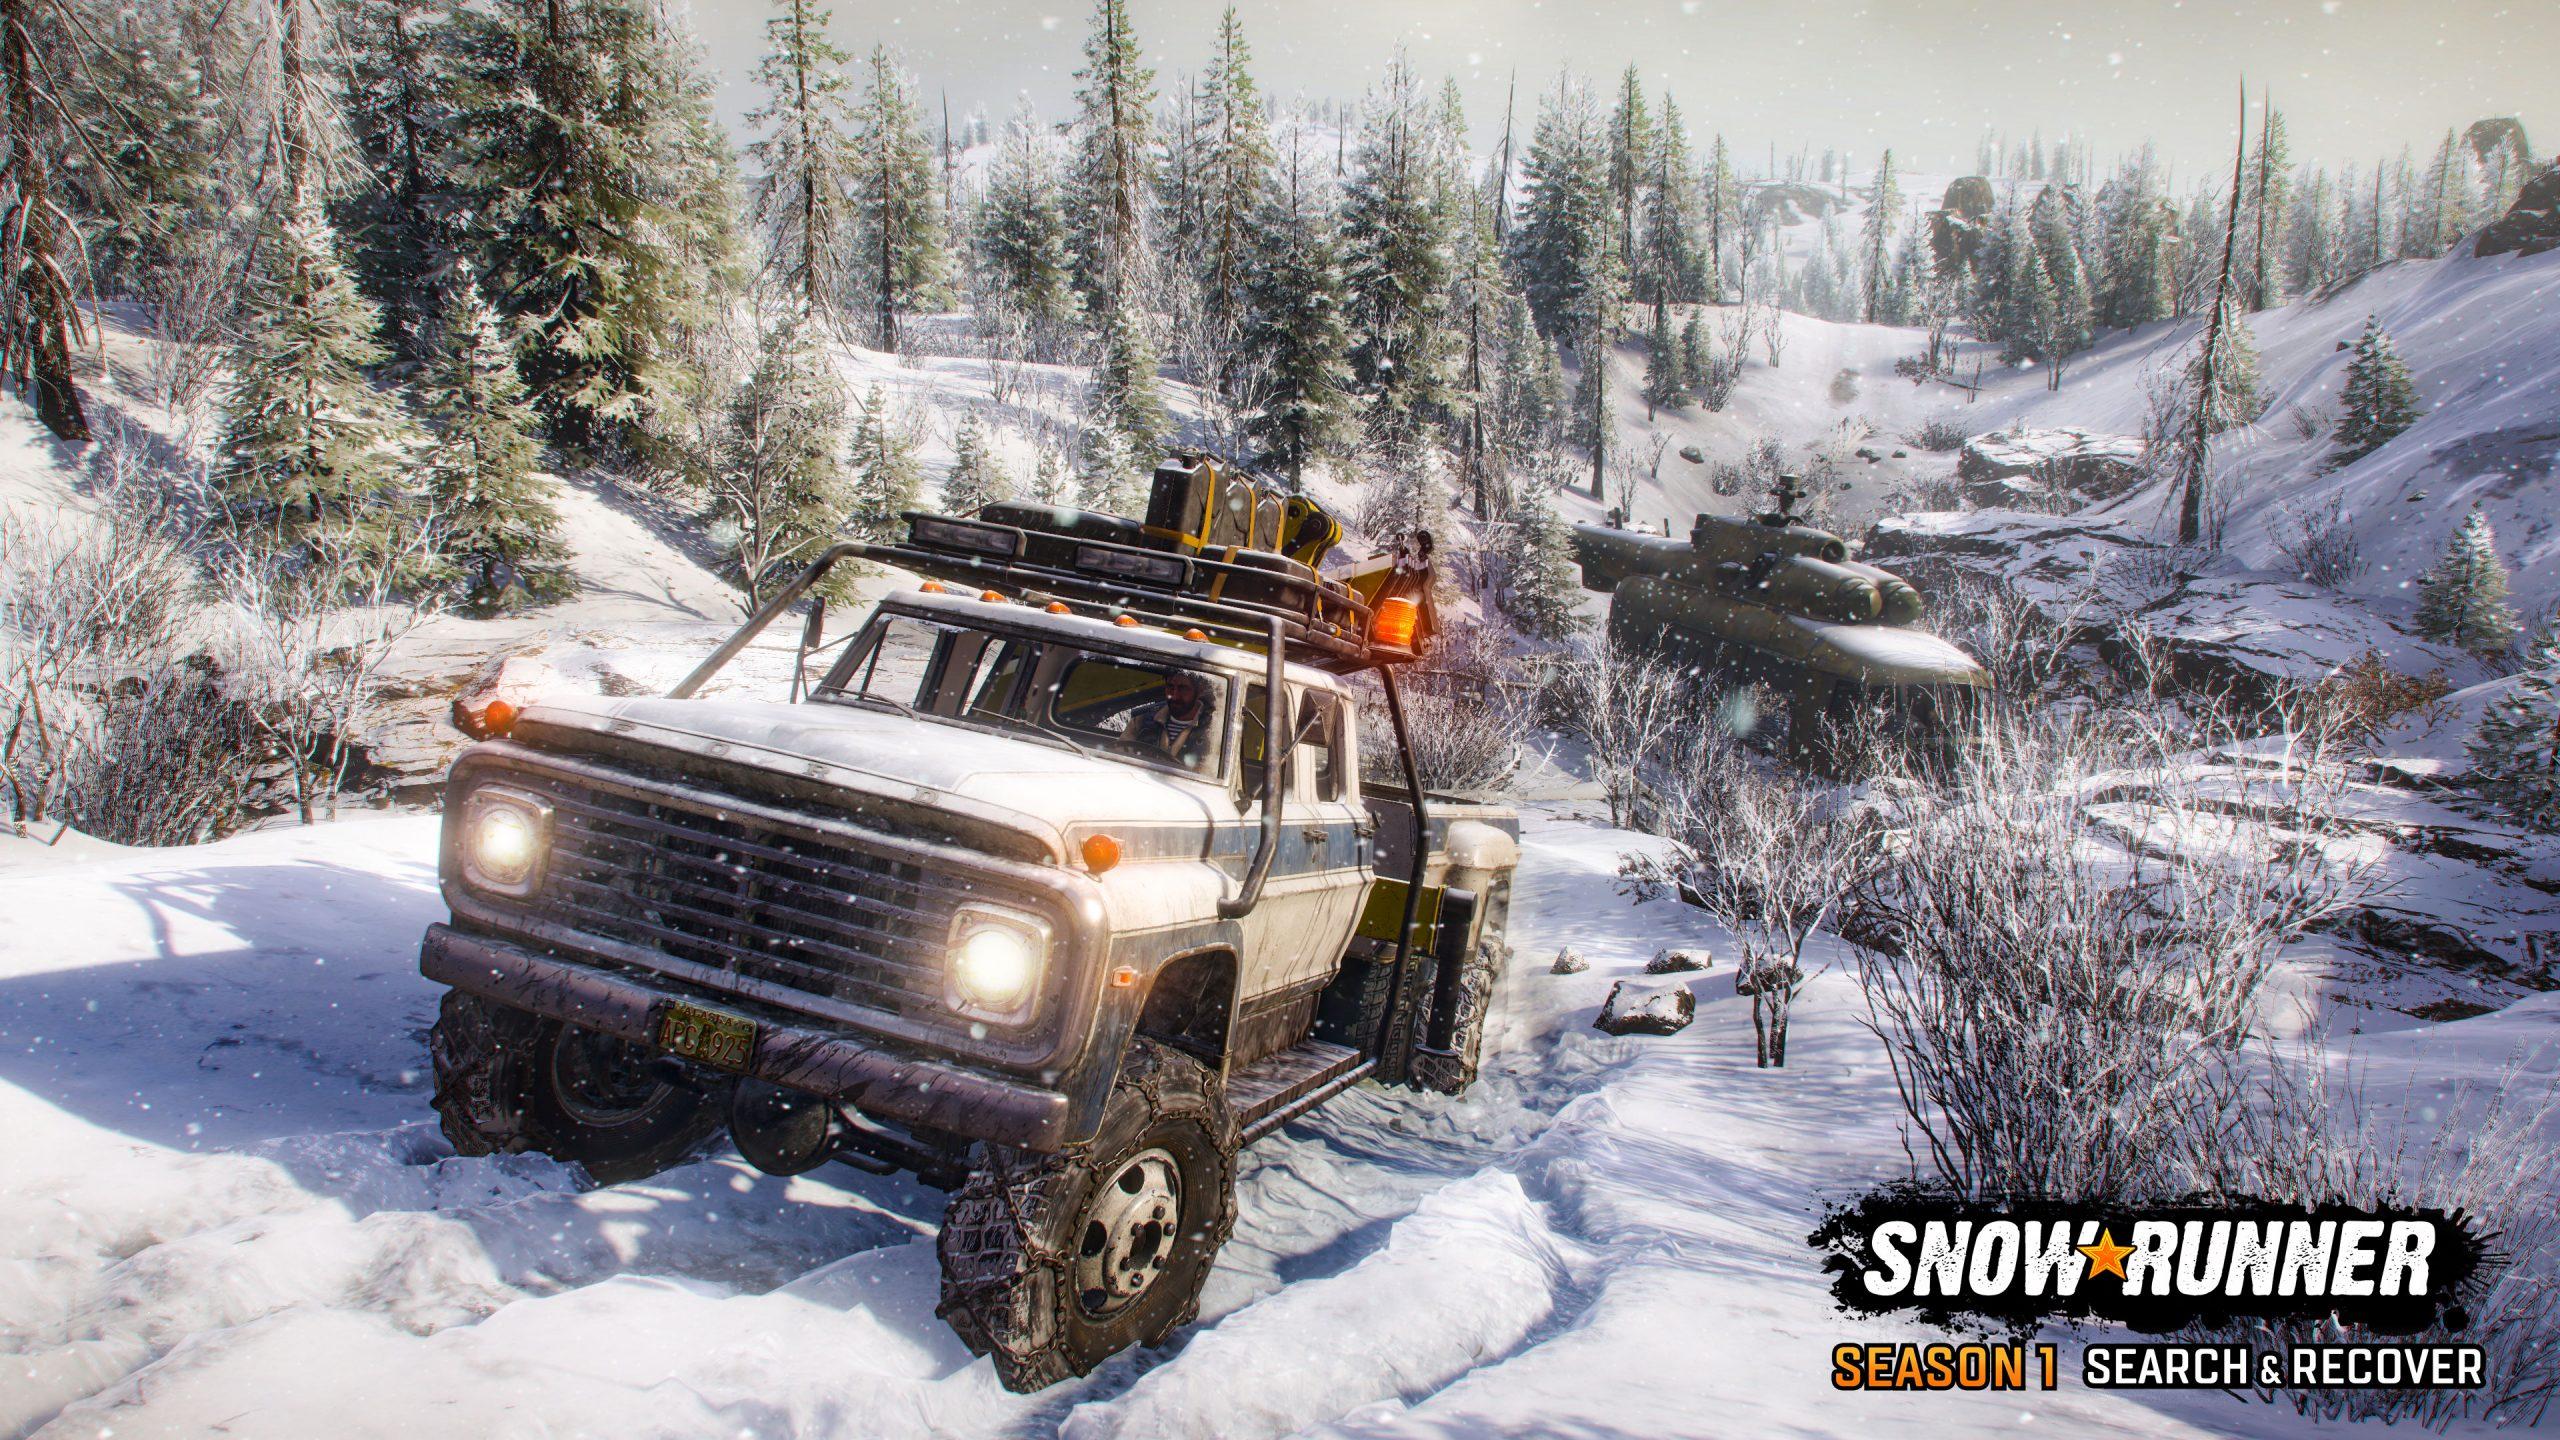 SnowRunner Season1 screenshot logo 03 scaled - SnowRunner Gets Its First Big DLC Next Week